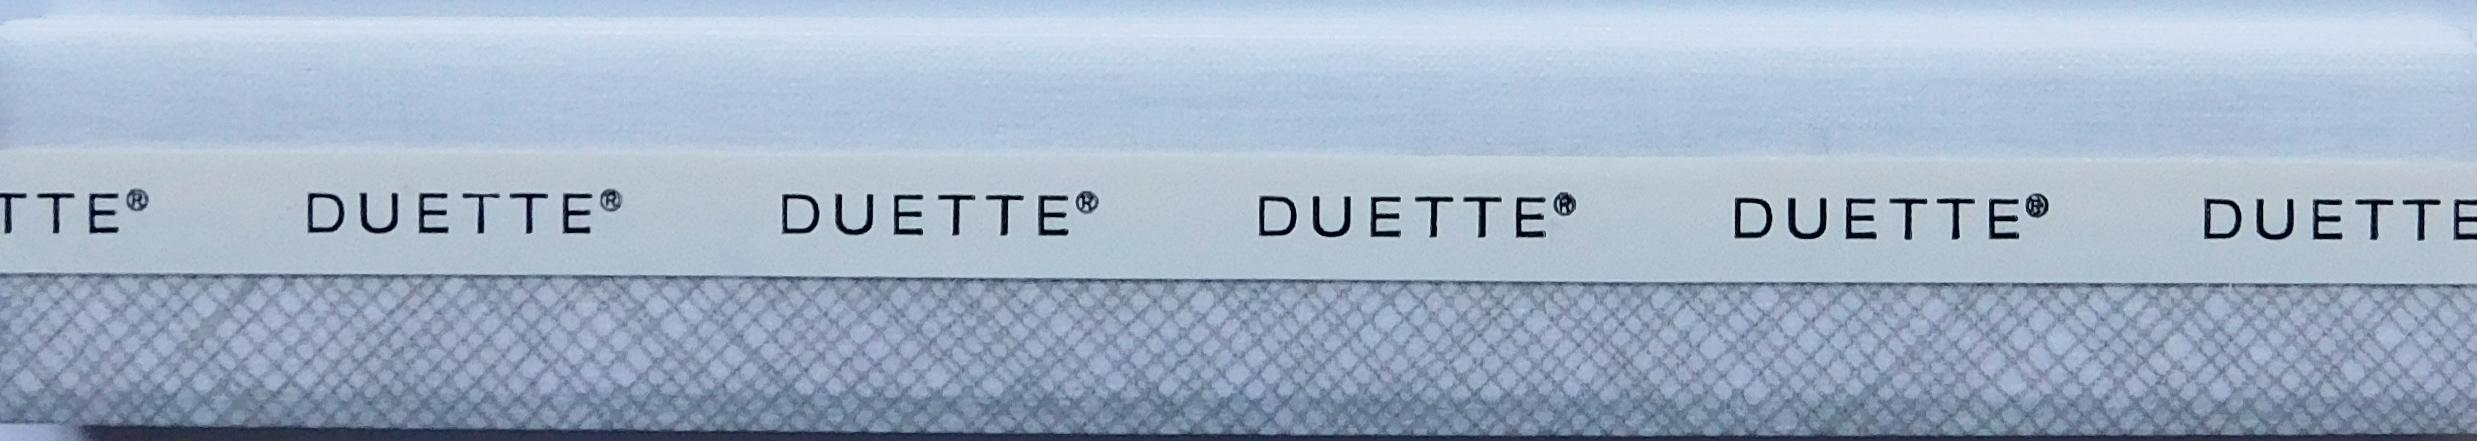 Divel Agate Grey Duette Blind Fabric